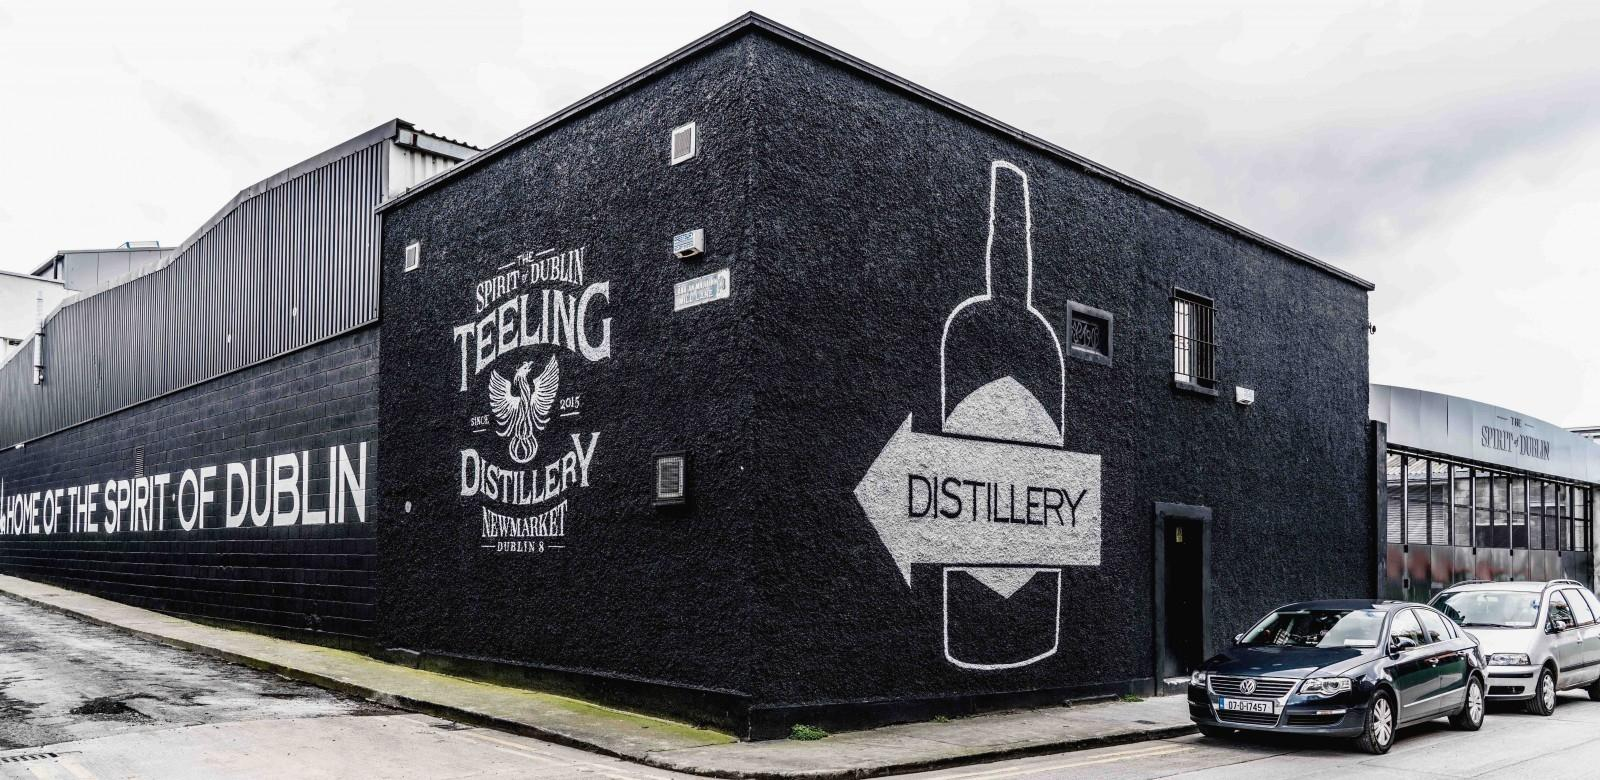 TEELING WHISKEY DISTILLERY, Dublin - Photo: Flickr/ William Murphy